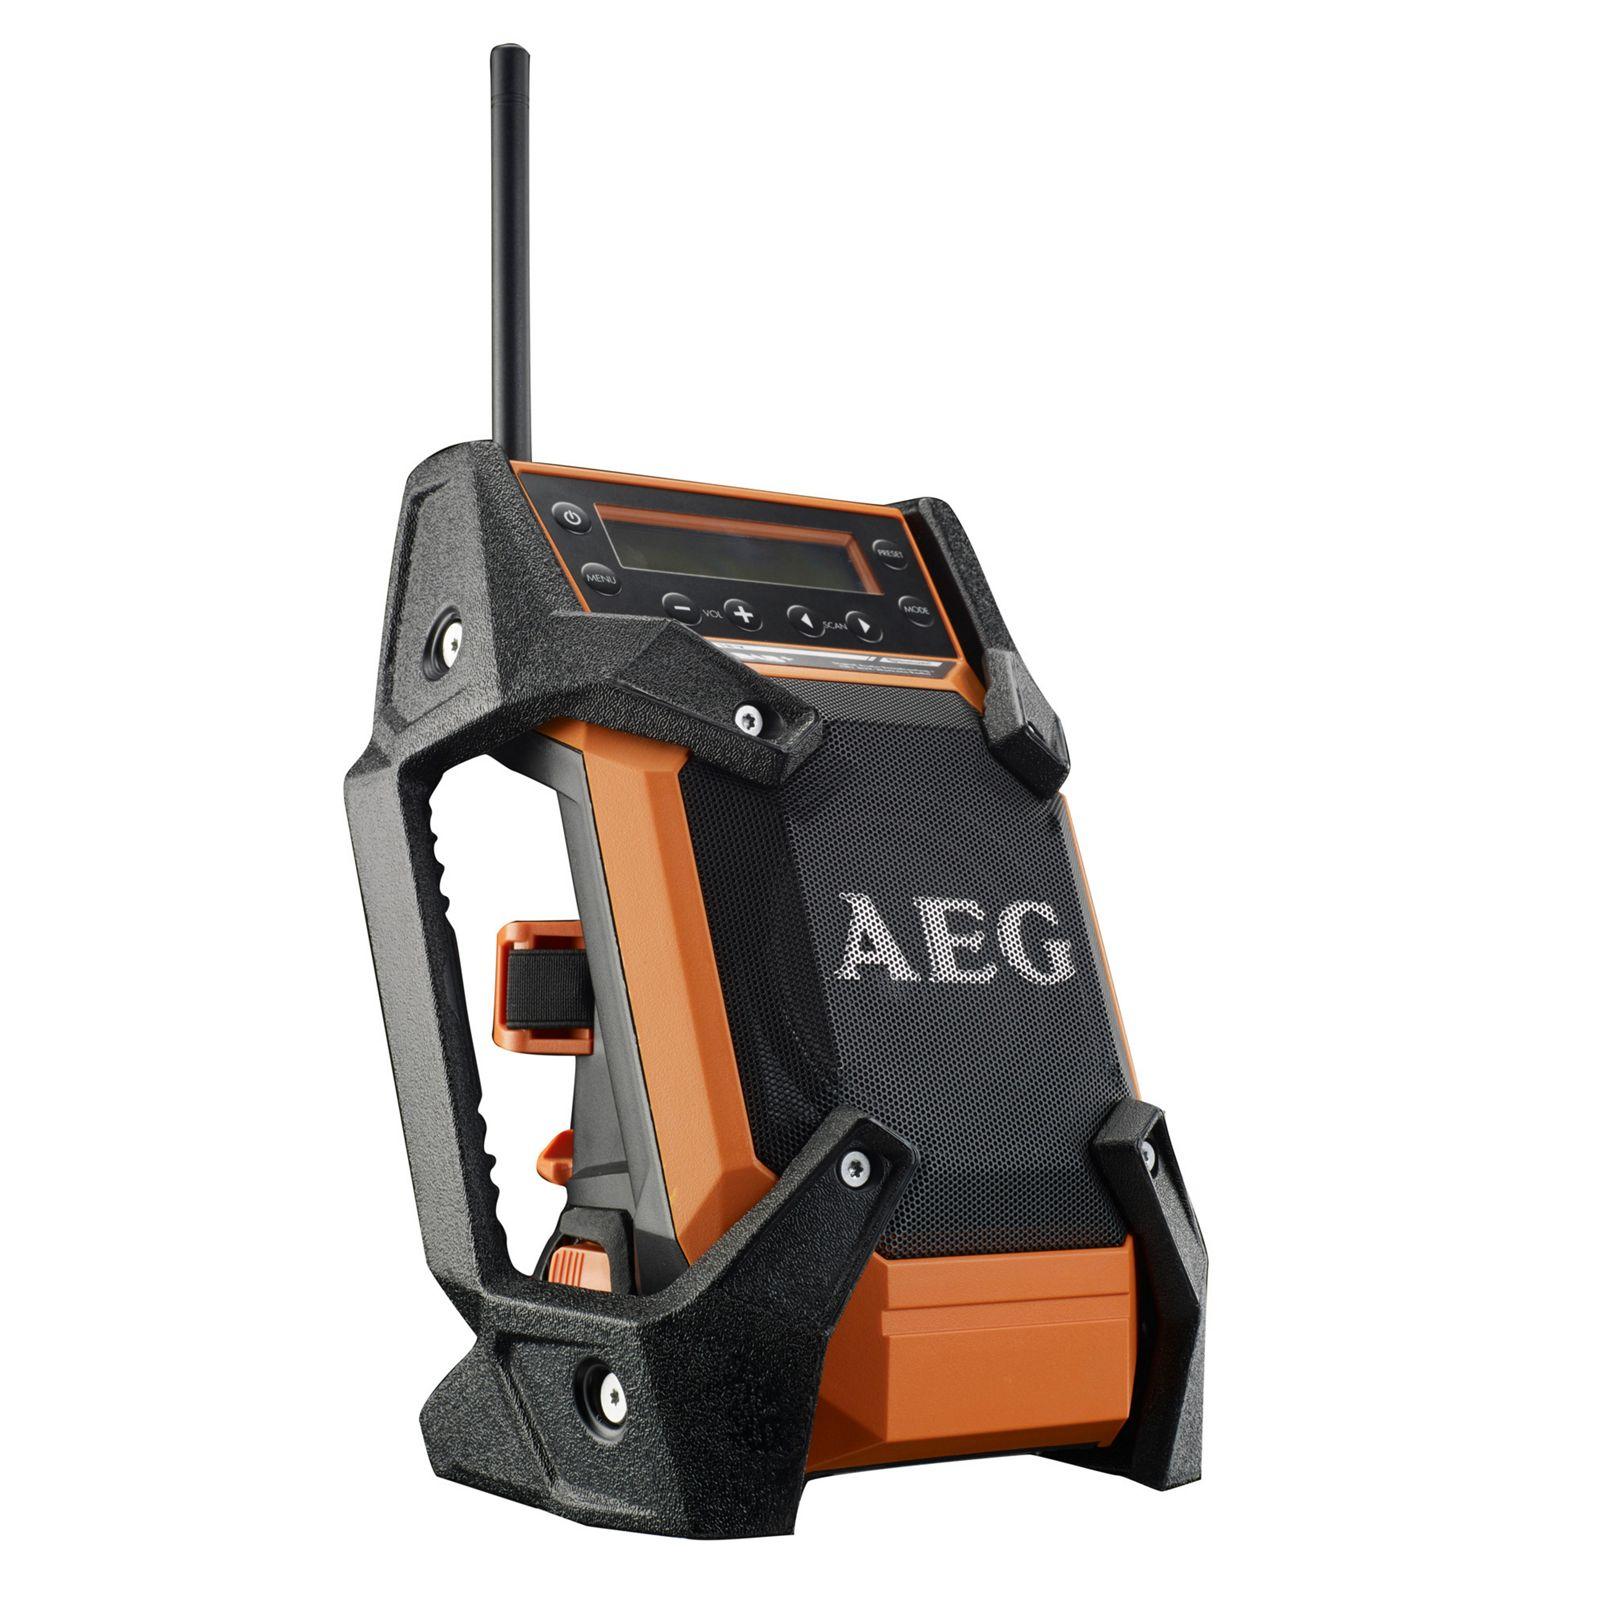 AEG 12-18V DAB+ Radio with Bluetooth Bare Unit (No Battery) £44.10 at Homebase Free C&C